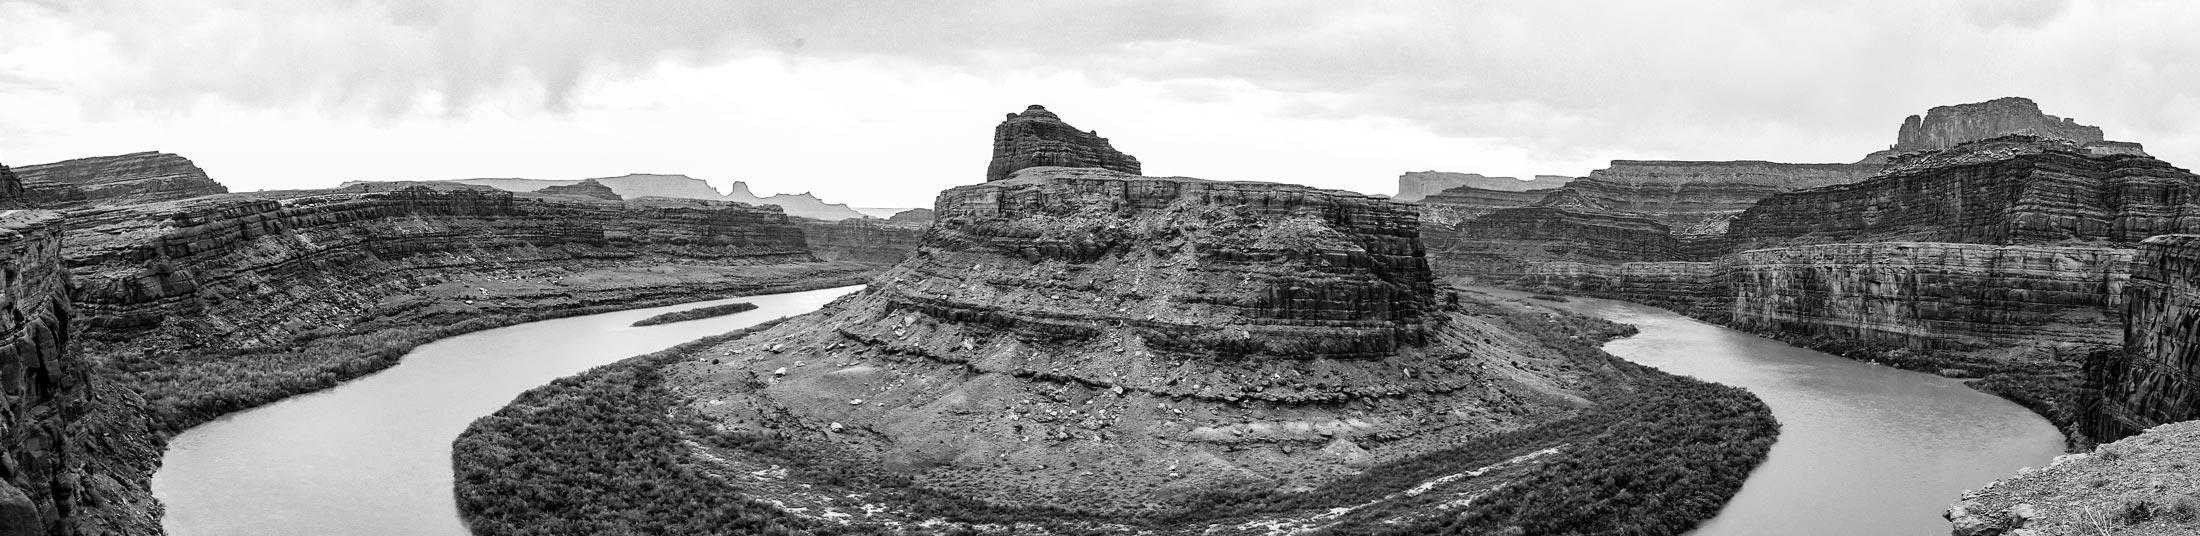 Utah-Moab-Arches-National-Park_12-BW